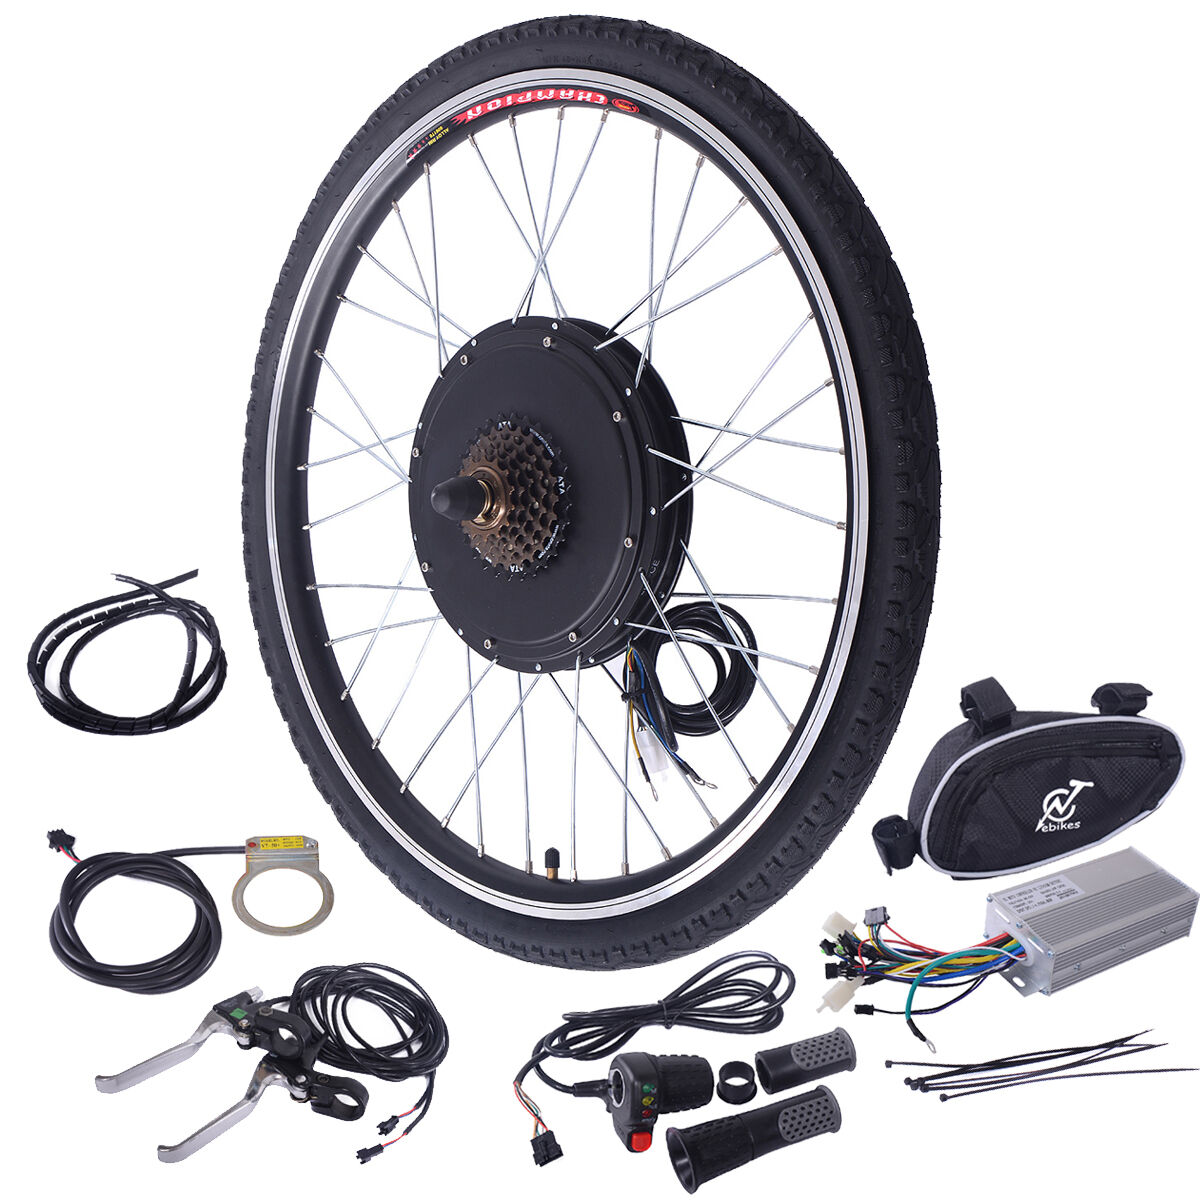 26 electric bicycle 48v 1000w rear wheel conversion kit for Rear wheel electric bicycle motor kit